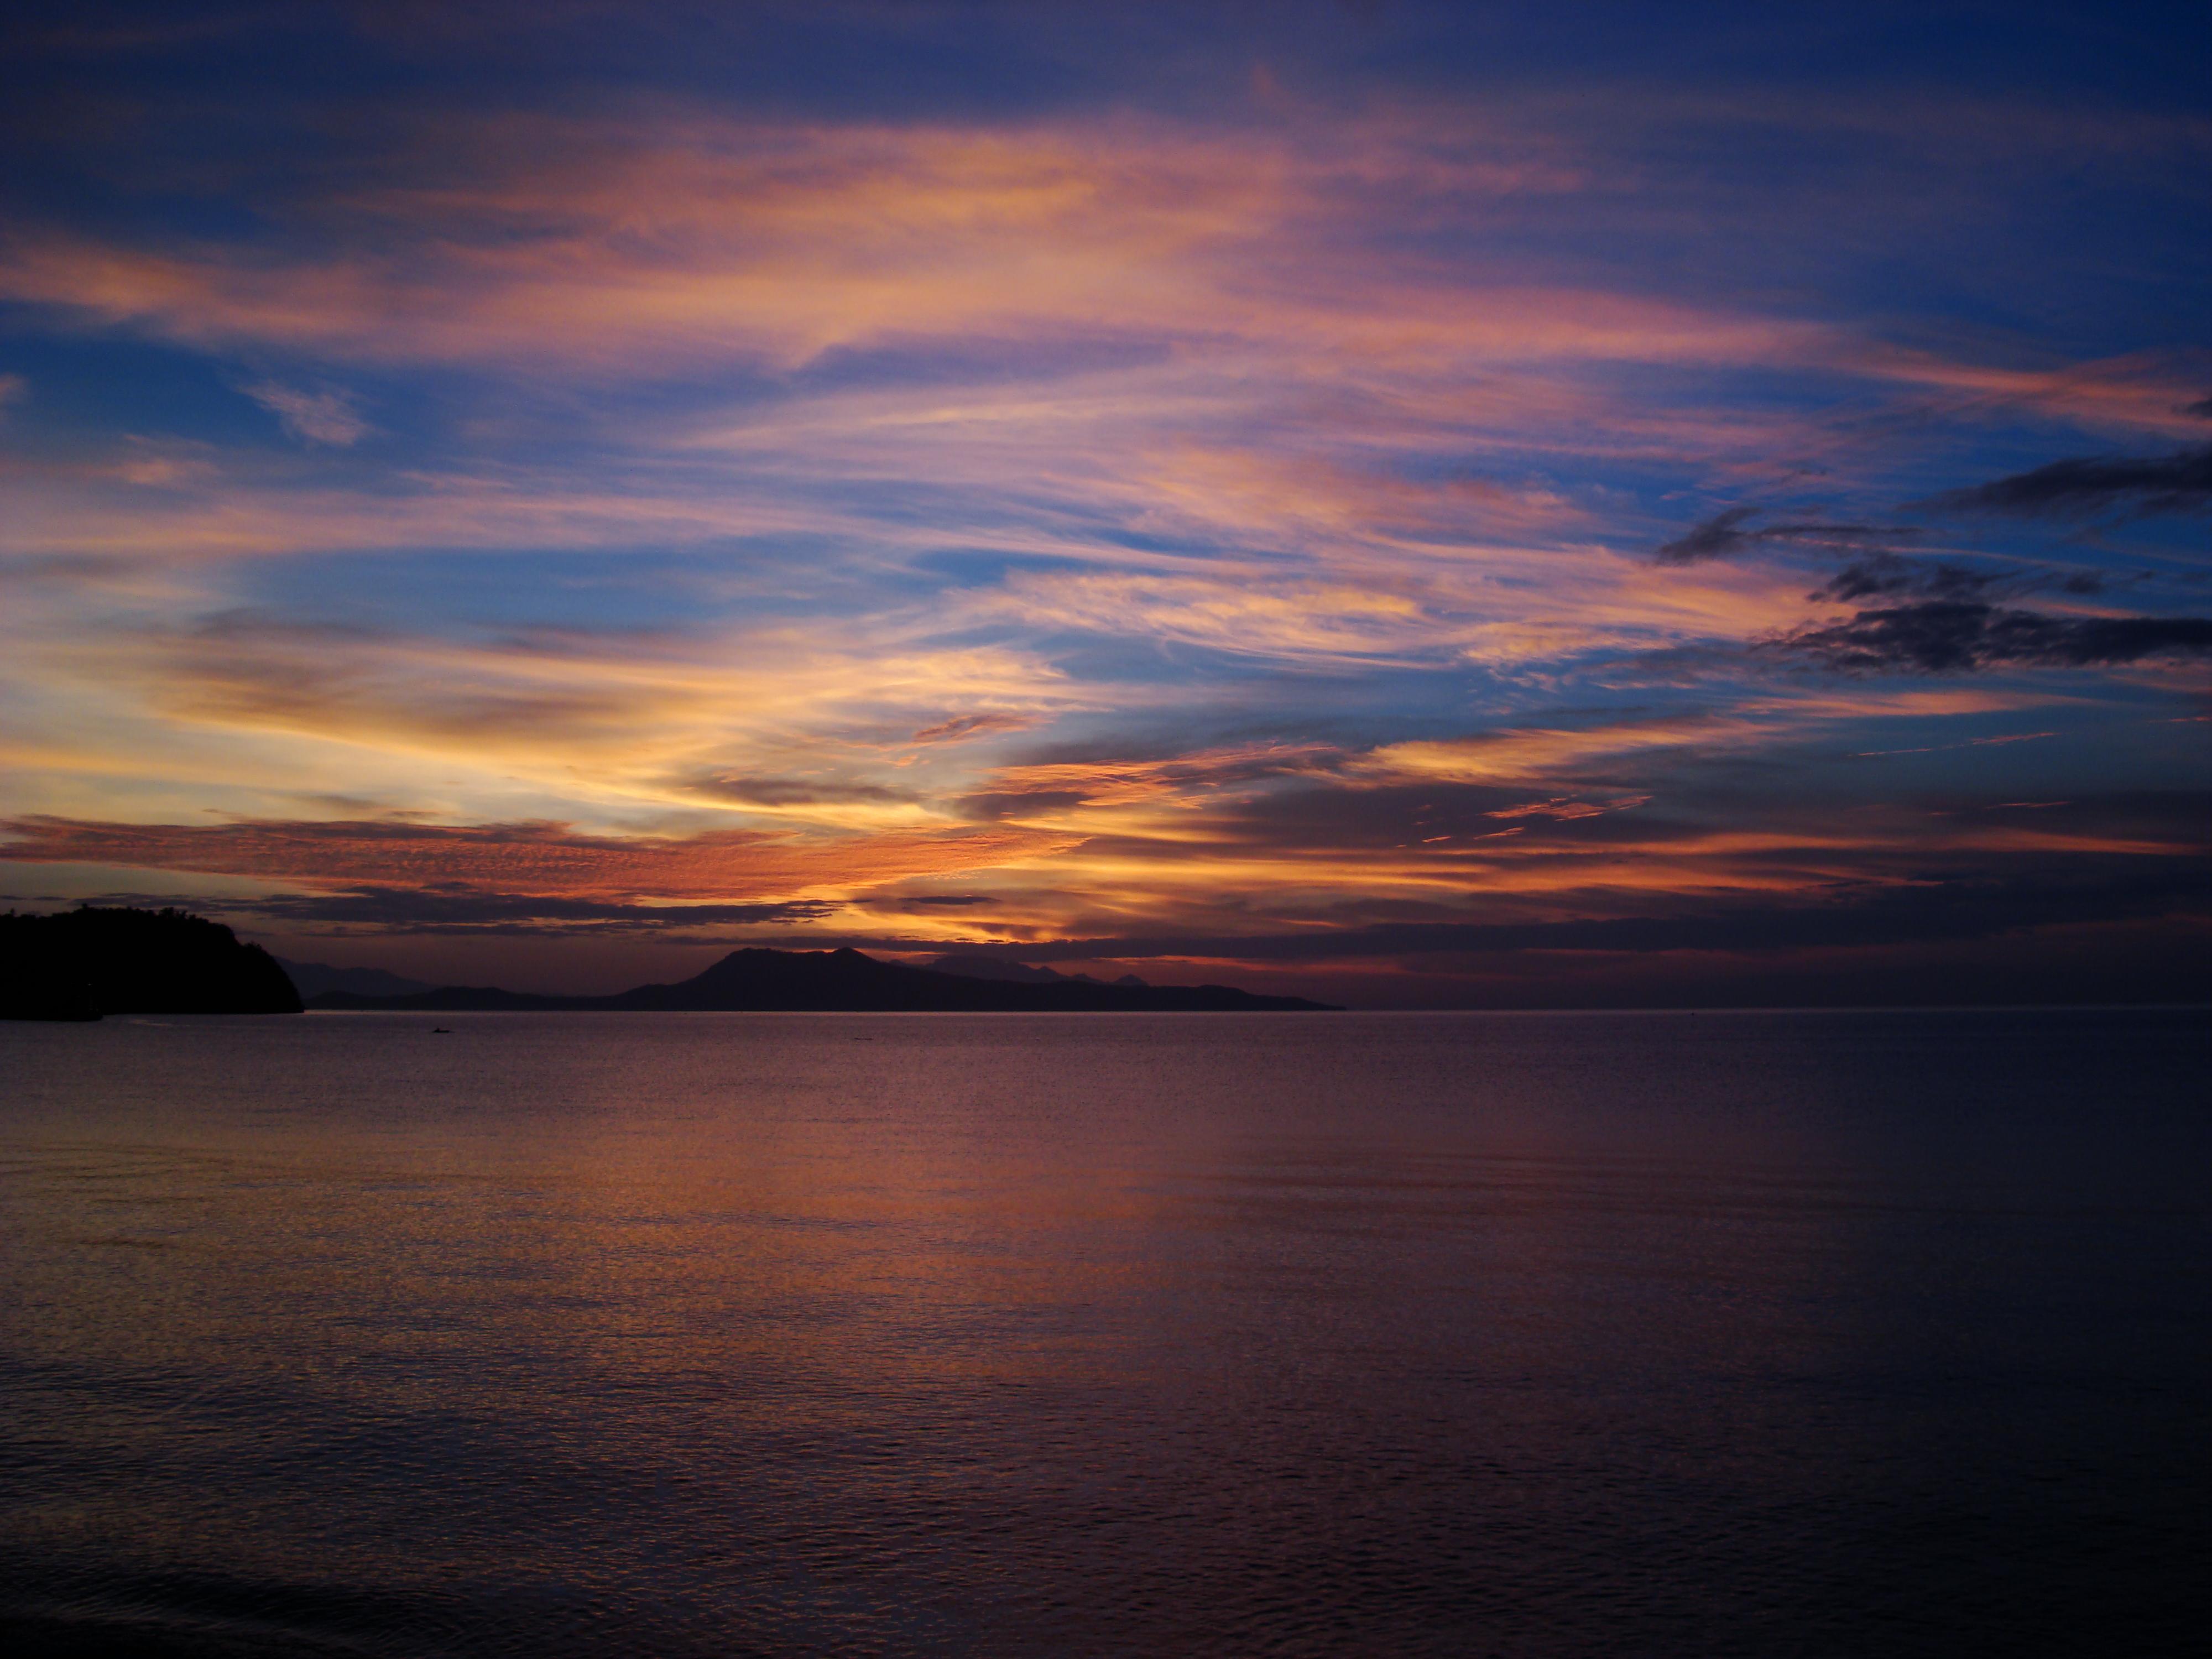 Sunrise Philippines Mindoro Island Tabinay 54